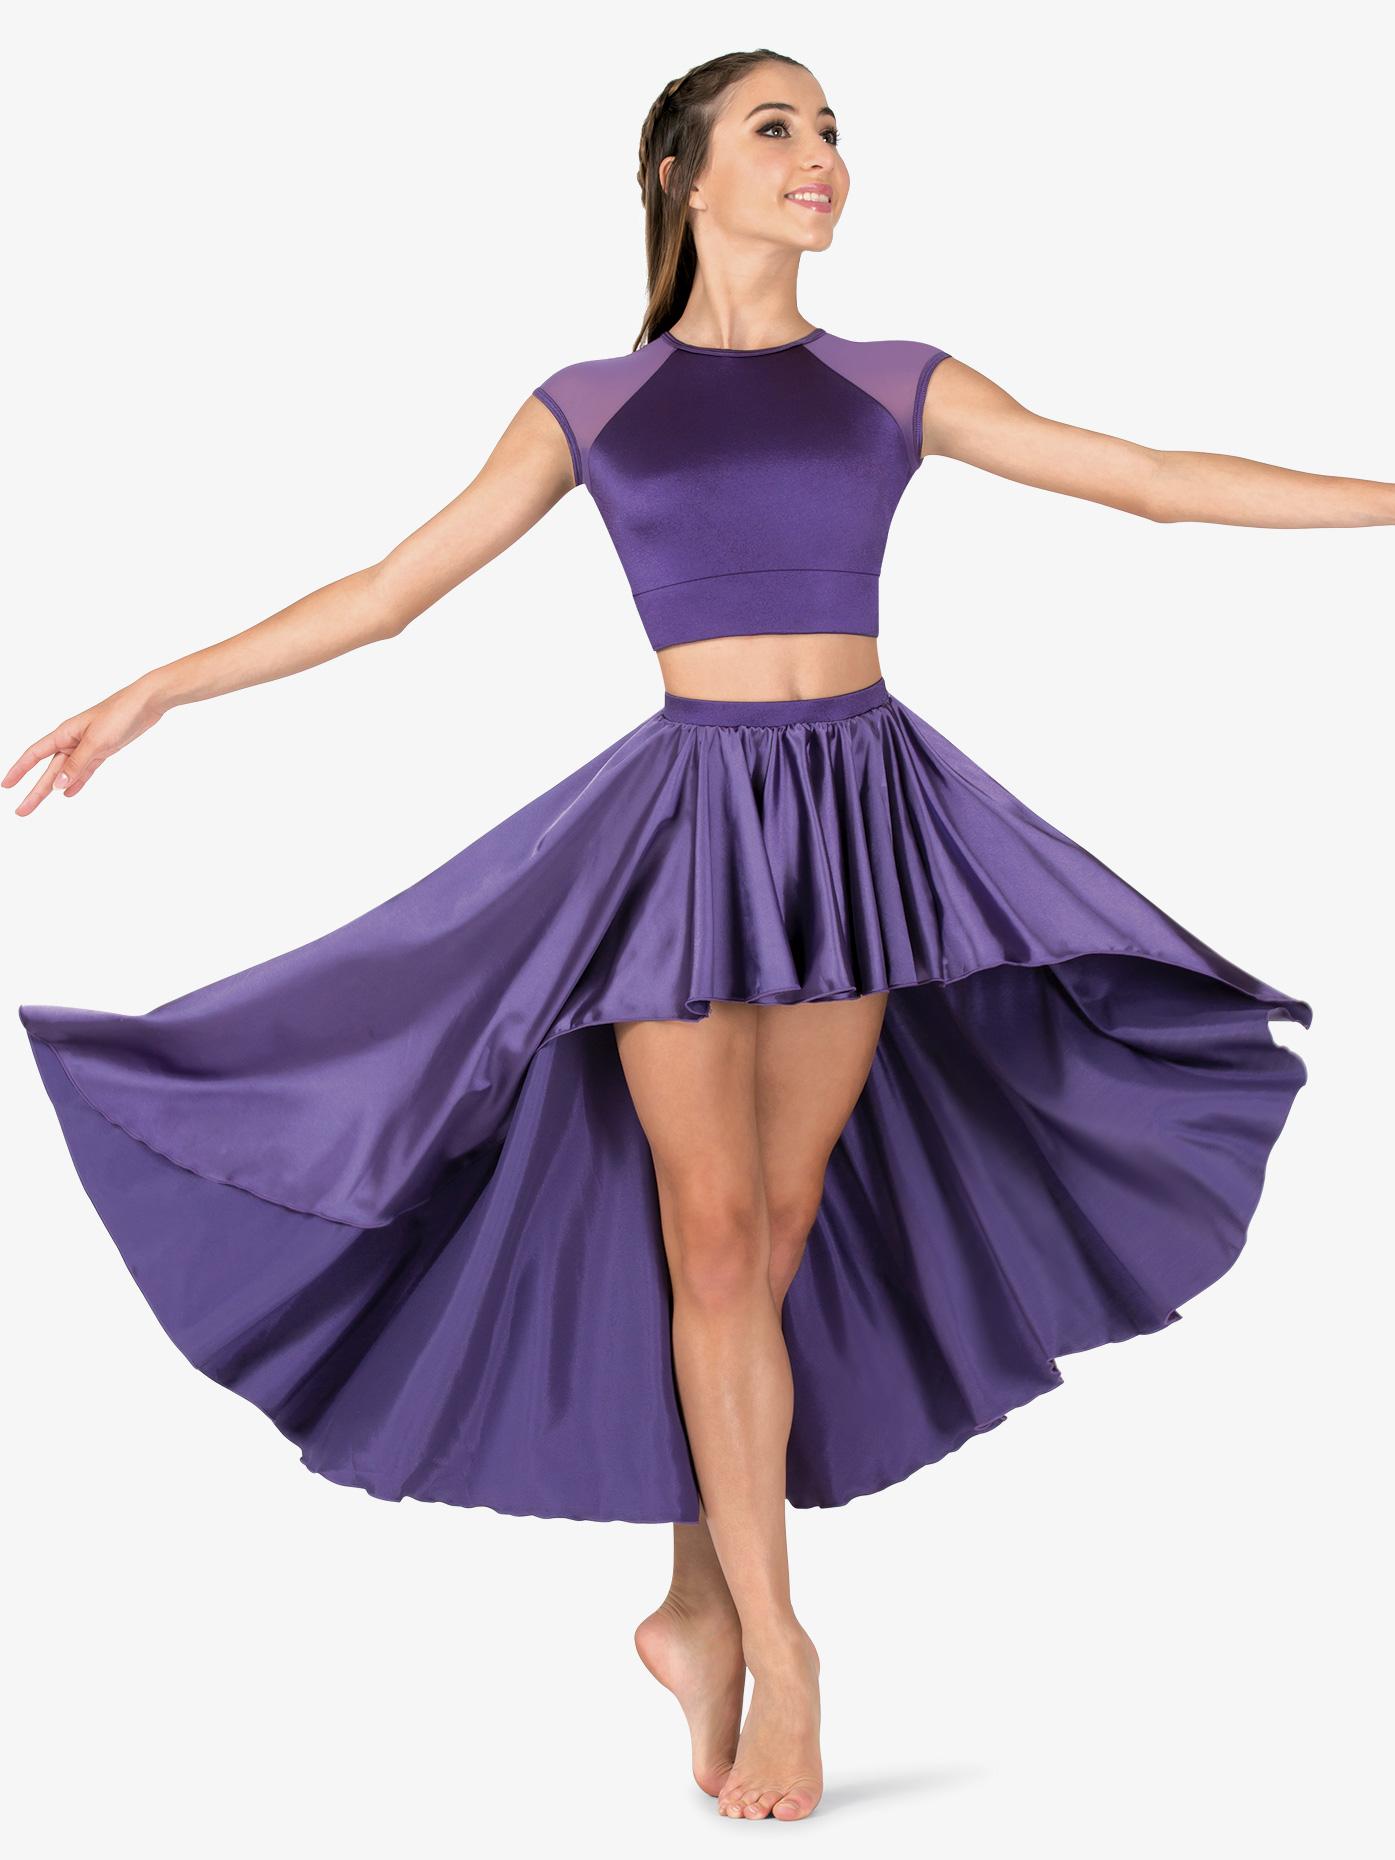 Double Platinum Womens Performance Satin High-Low Skirt N7686